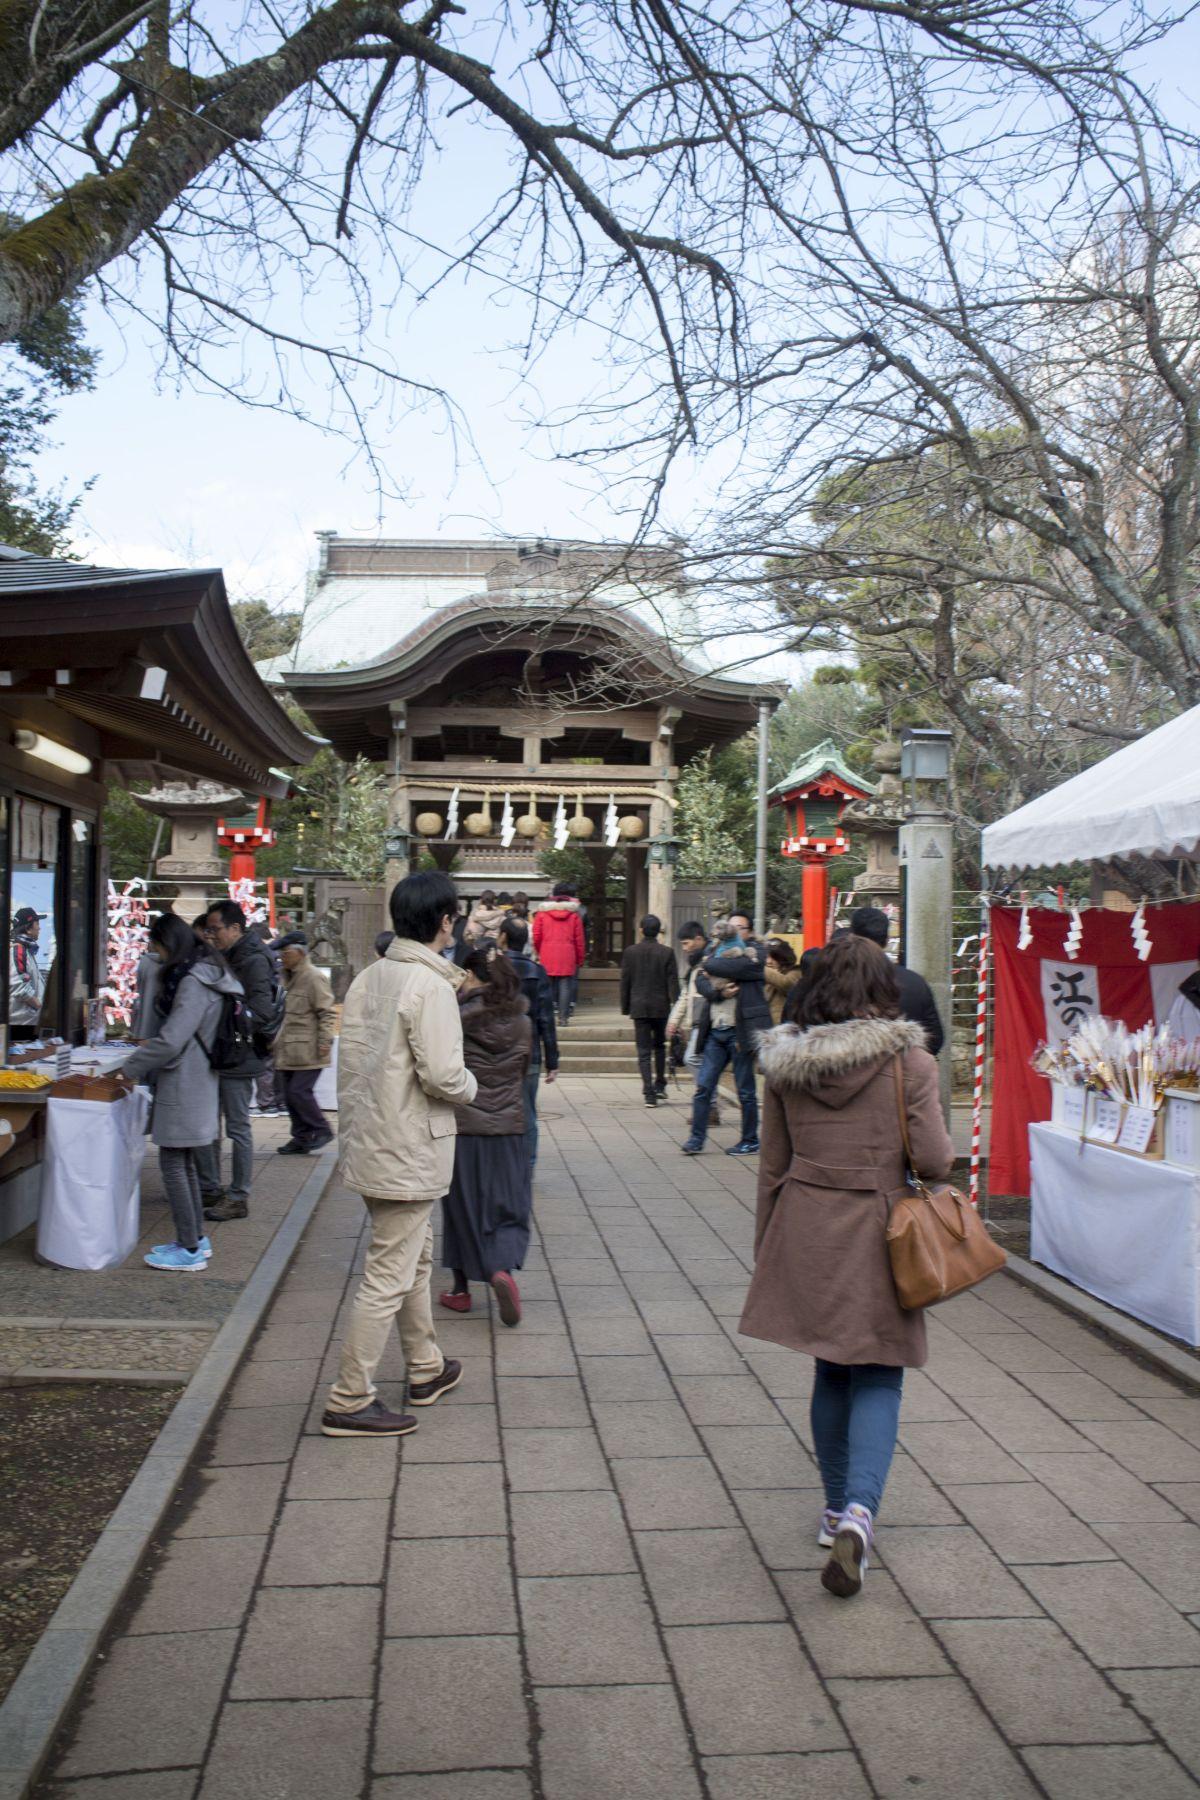 Enoshima: Winter Illumination